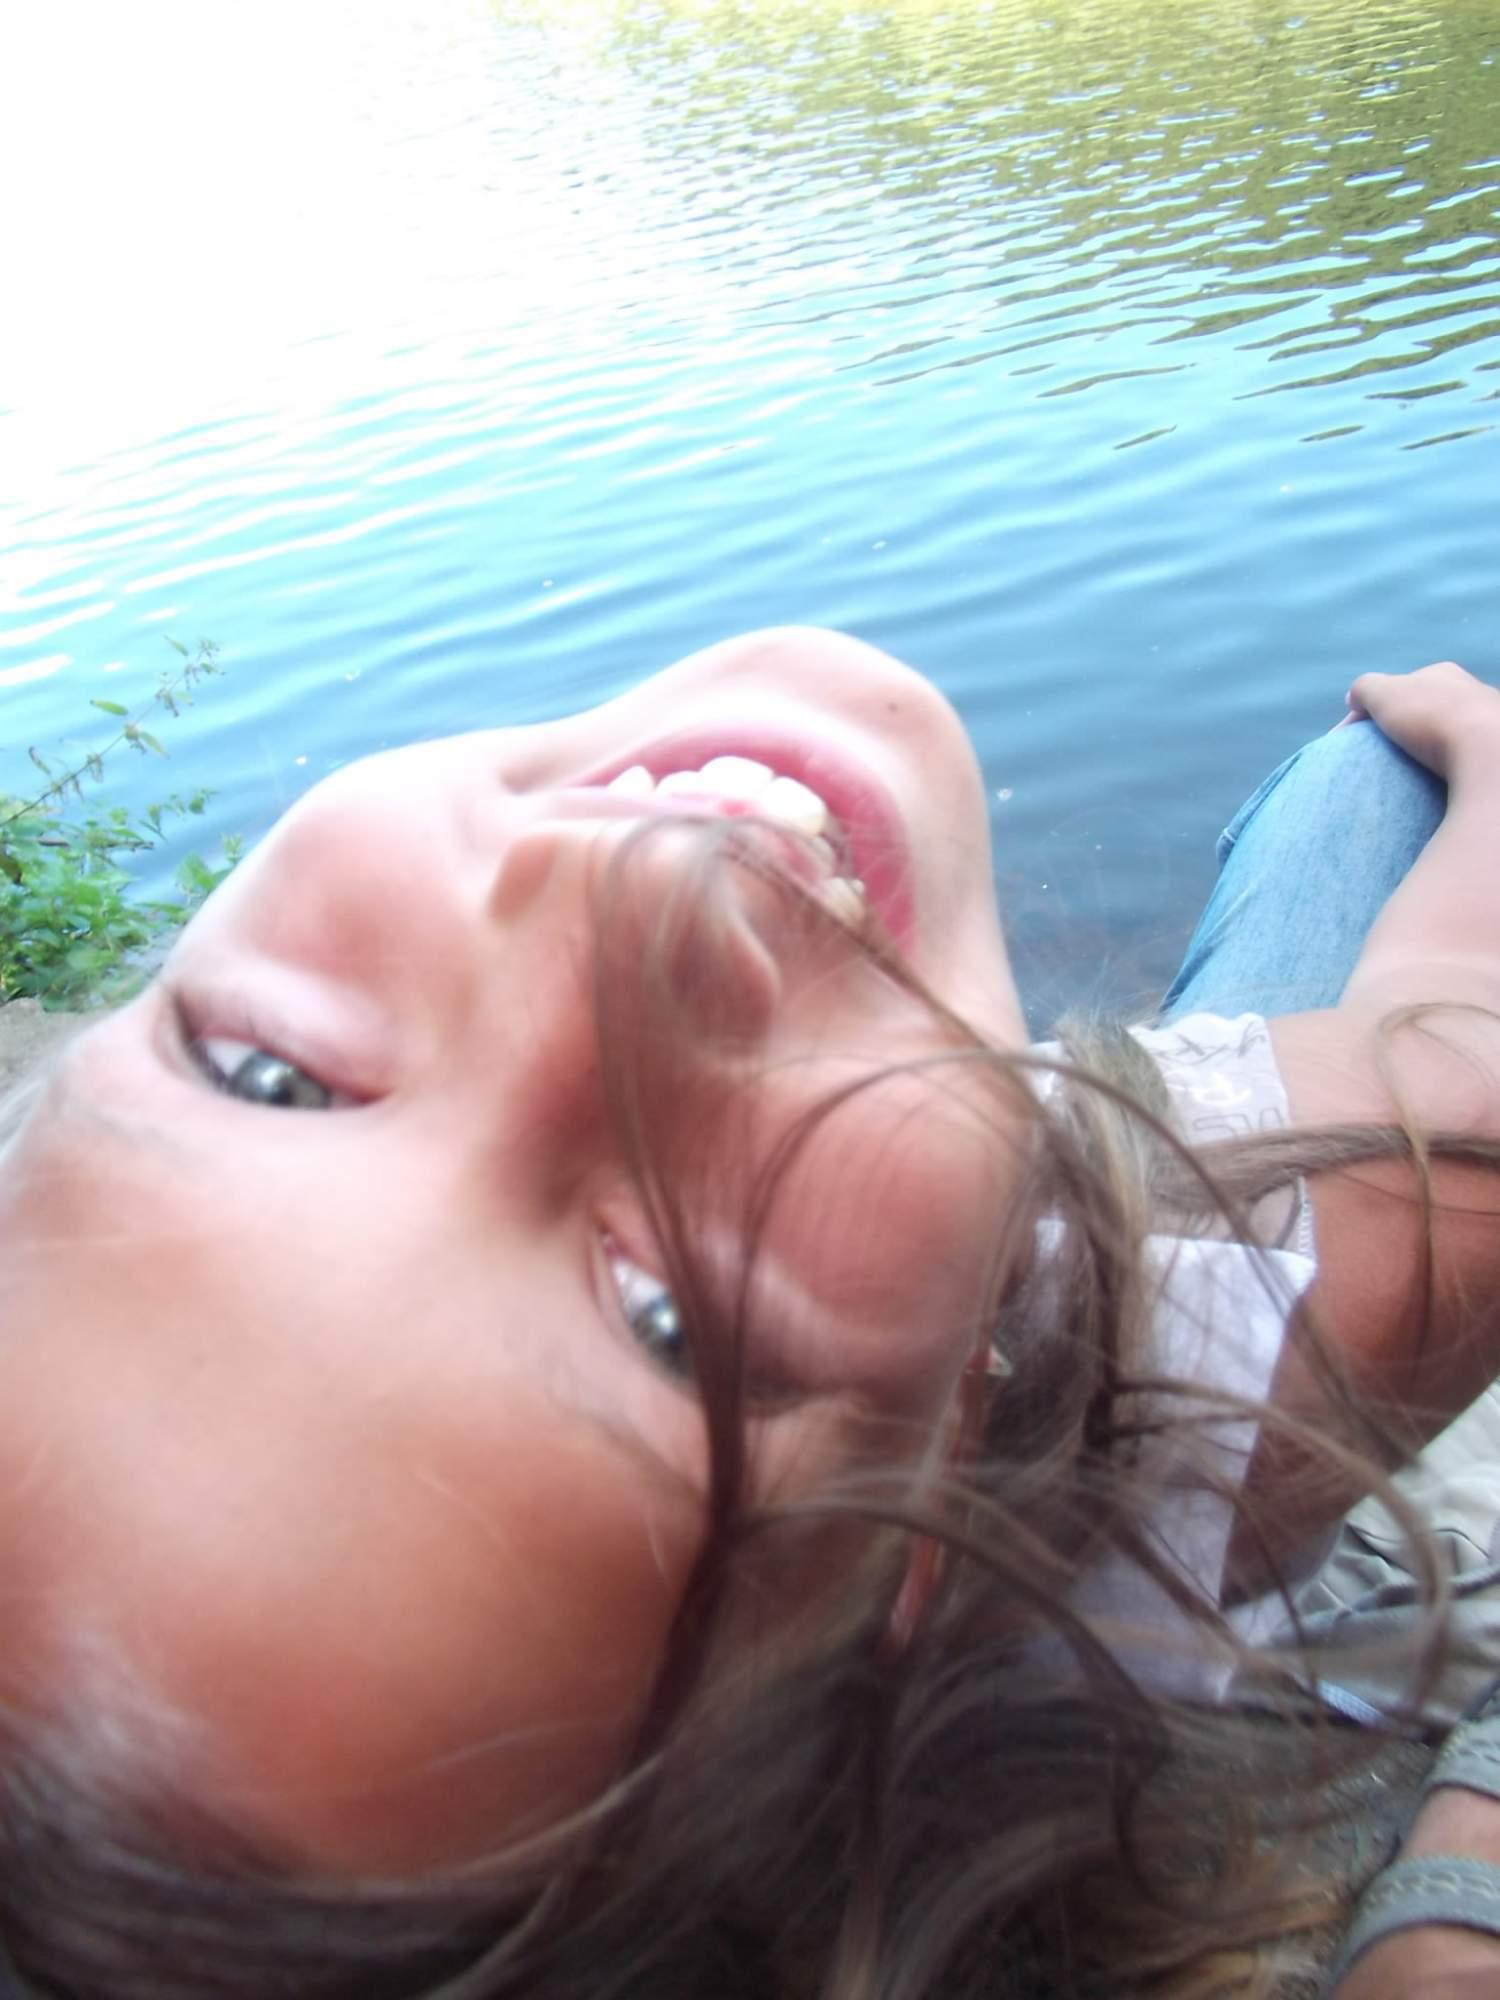 rajce.idnes.ru naked.7